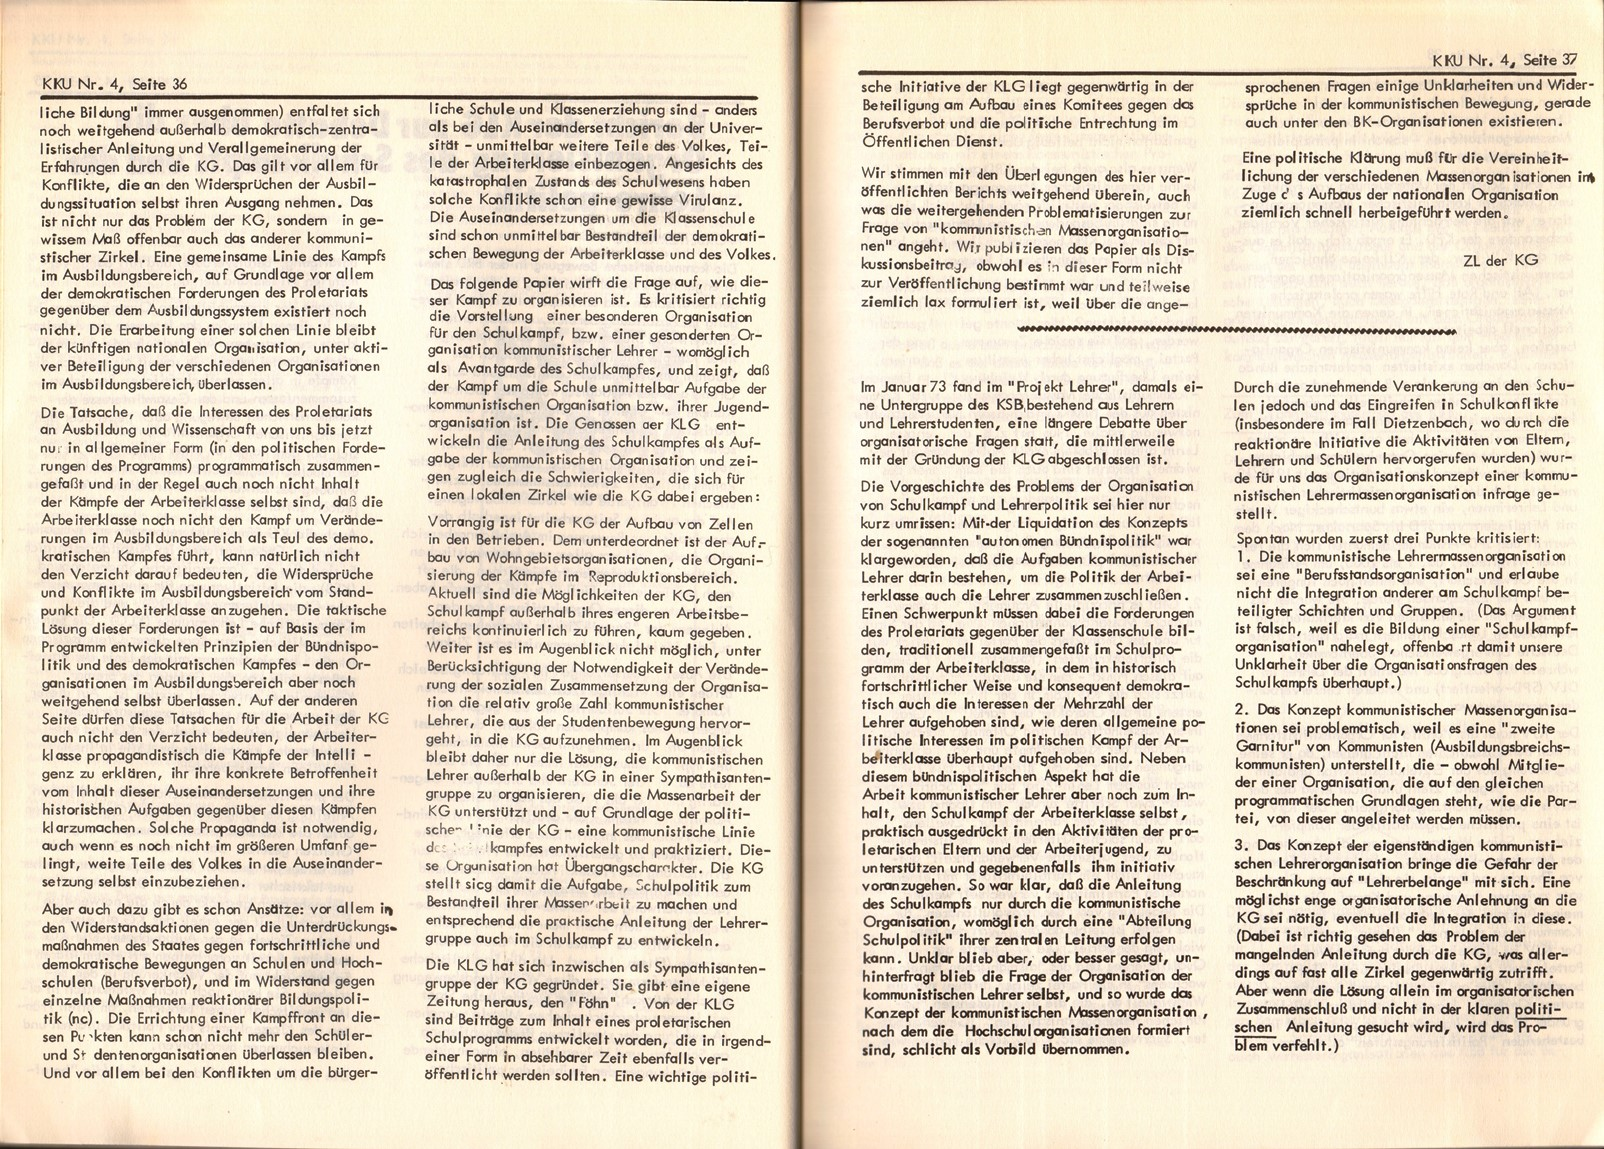 Frankfurt_Offenbach_KG_Kampf_Kritik_Umgestaltung_1973_04_05_19